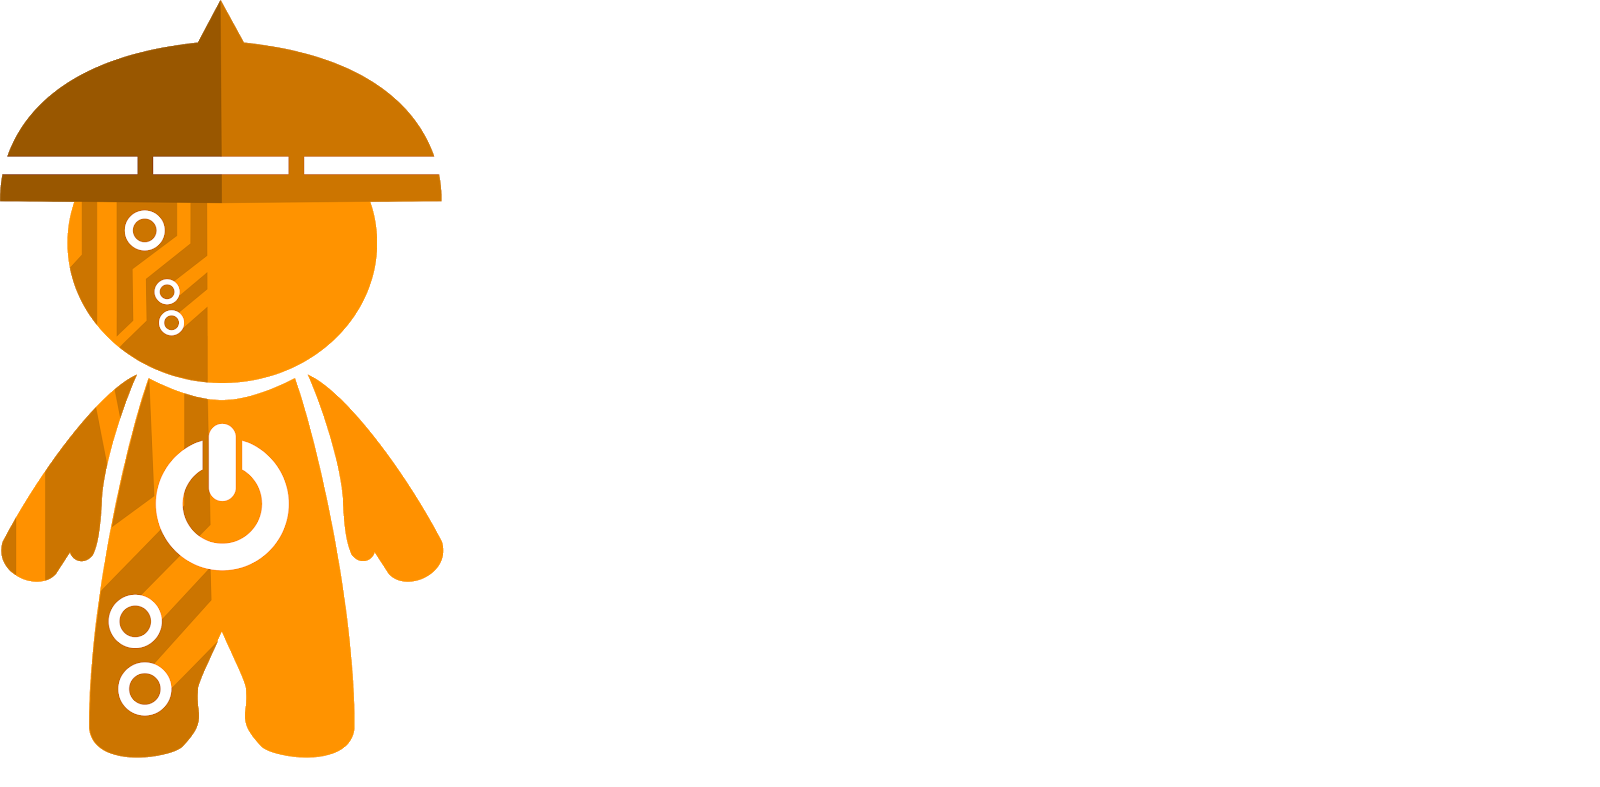 Computer Professionals' Union